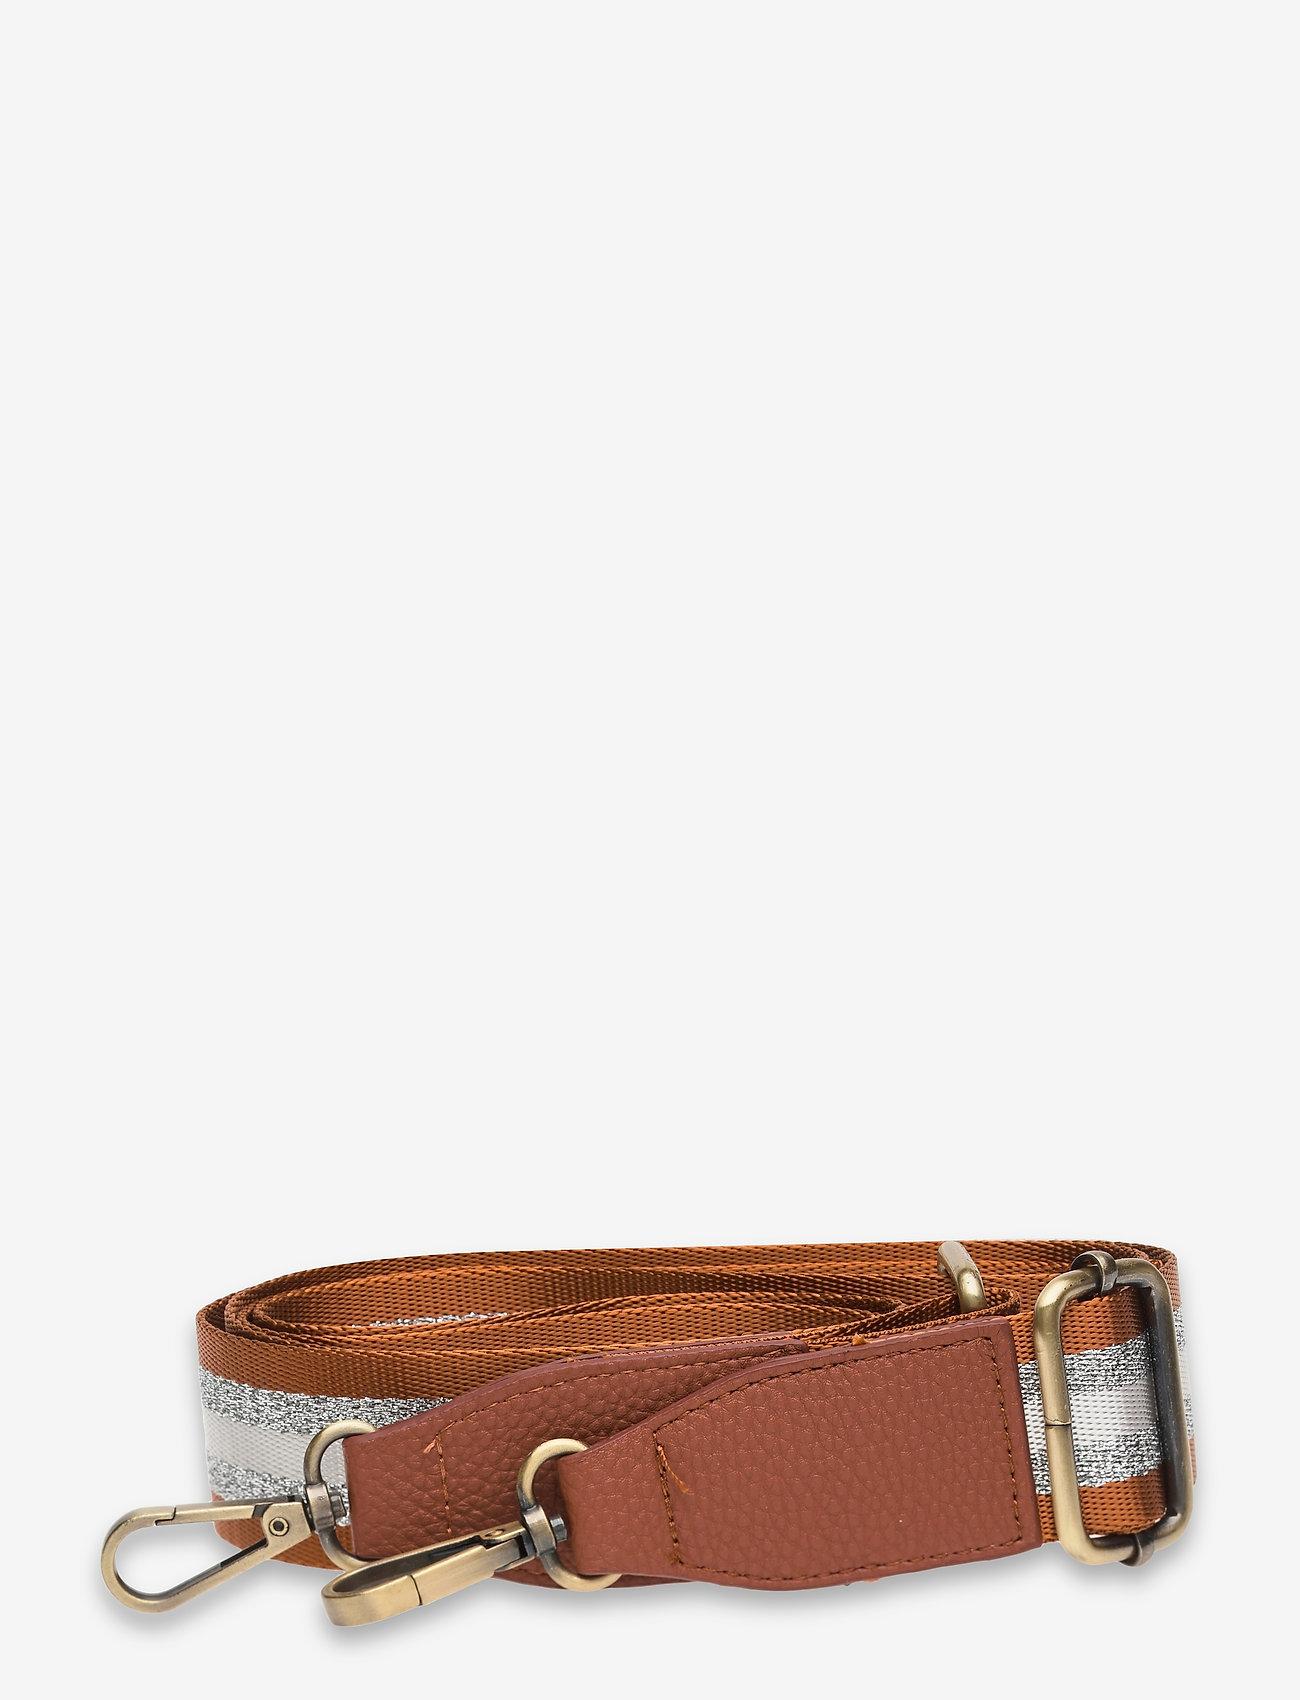 PIPOL'S BAZAAR - Strap Striped Rusty Brown Silver - axelremmar - multi - 0